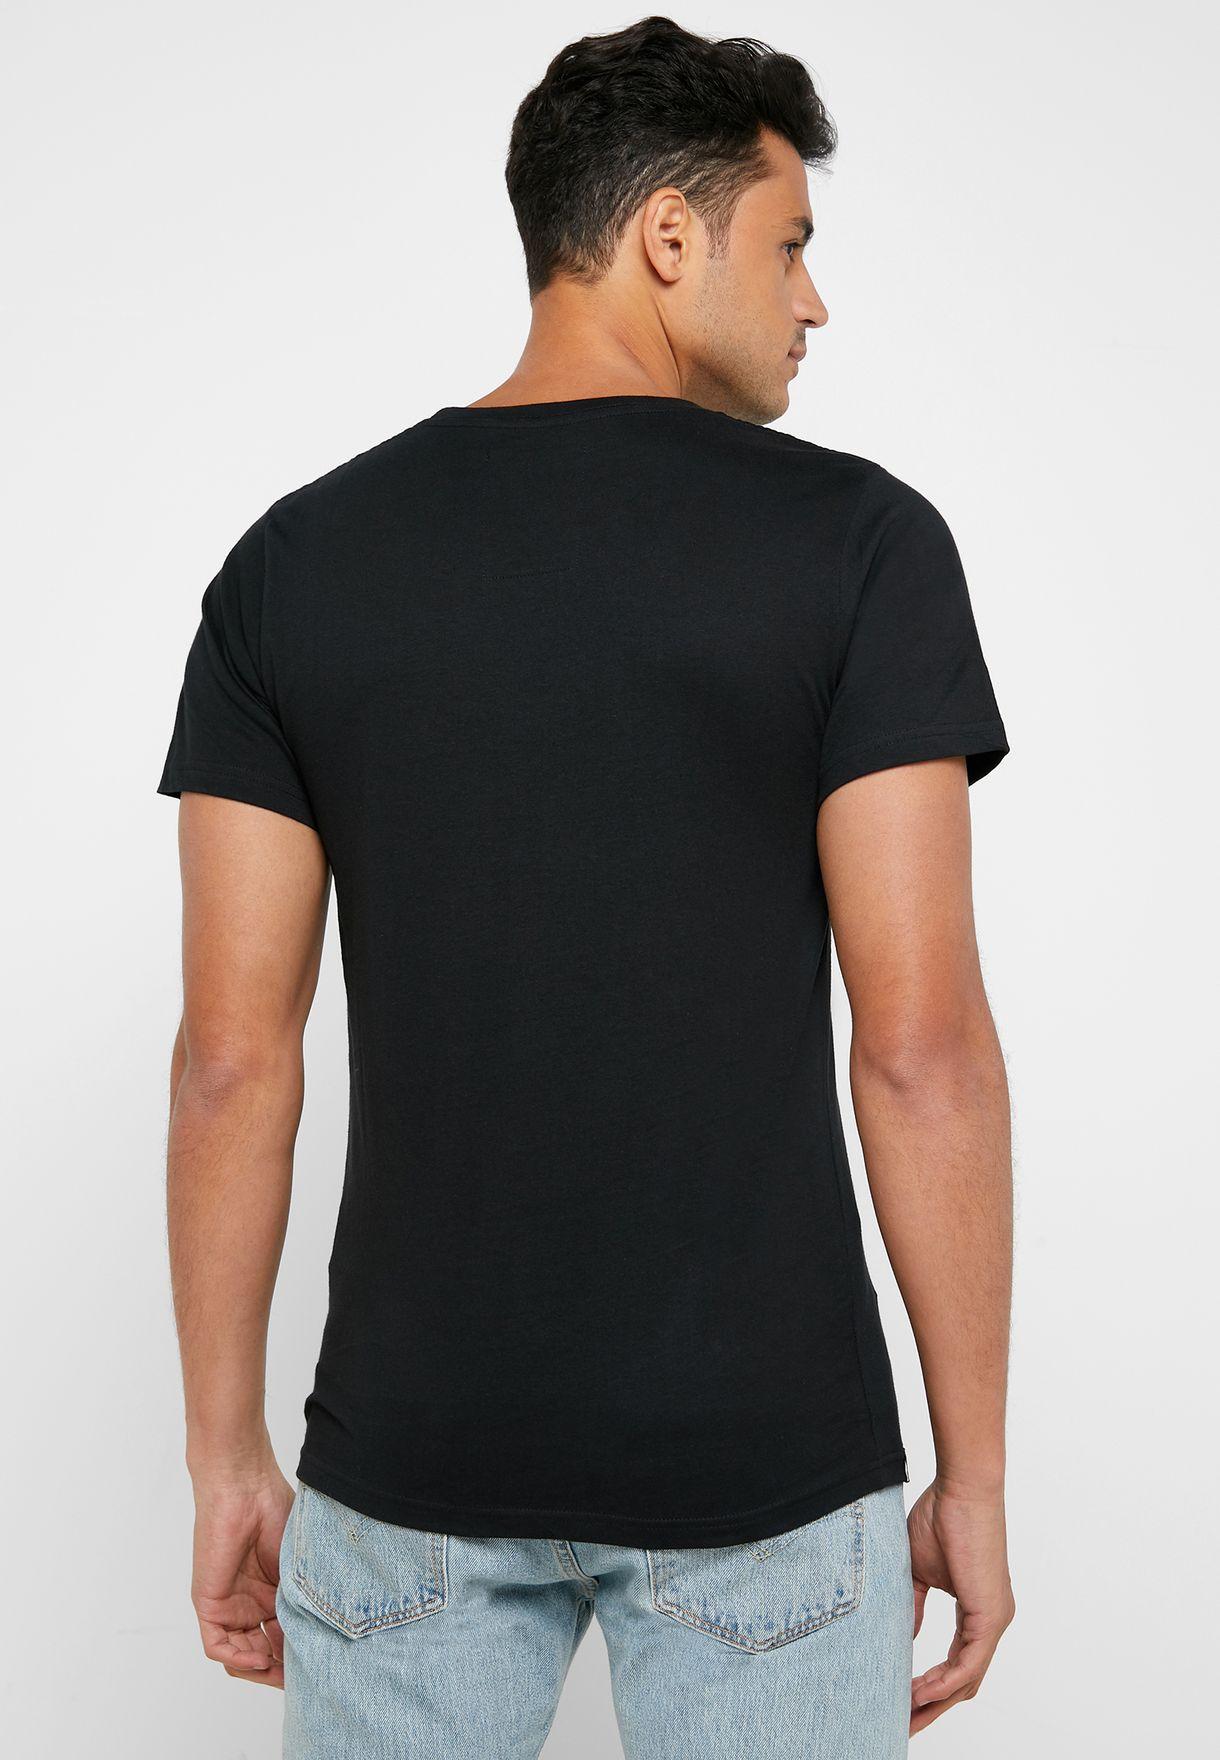 Stockholm Wu-Tang Crew Neck T-Shirt